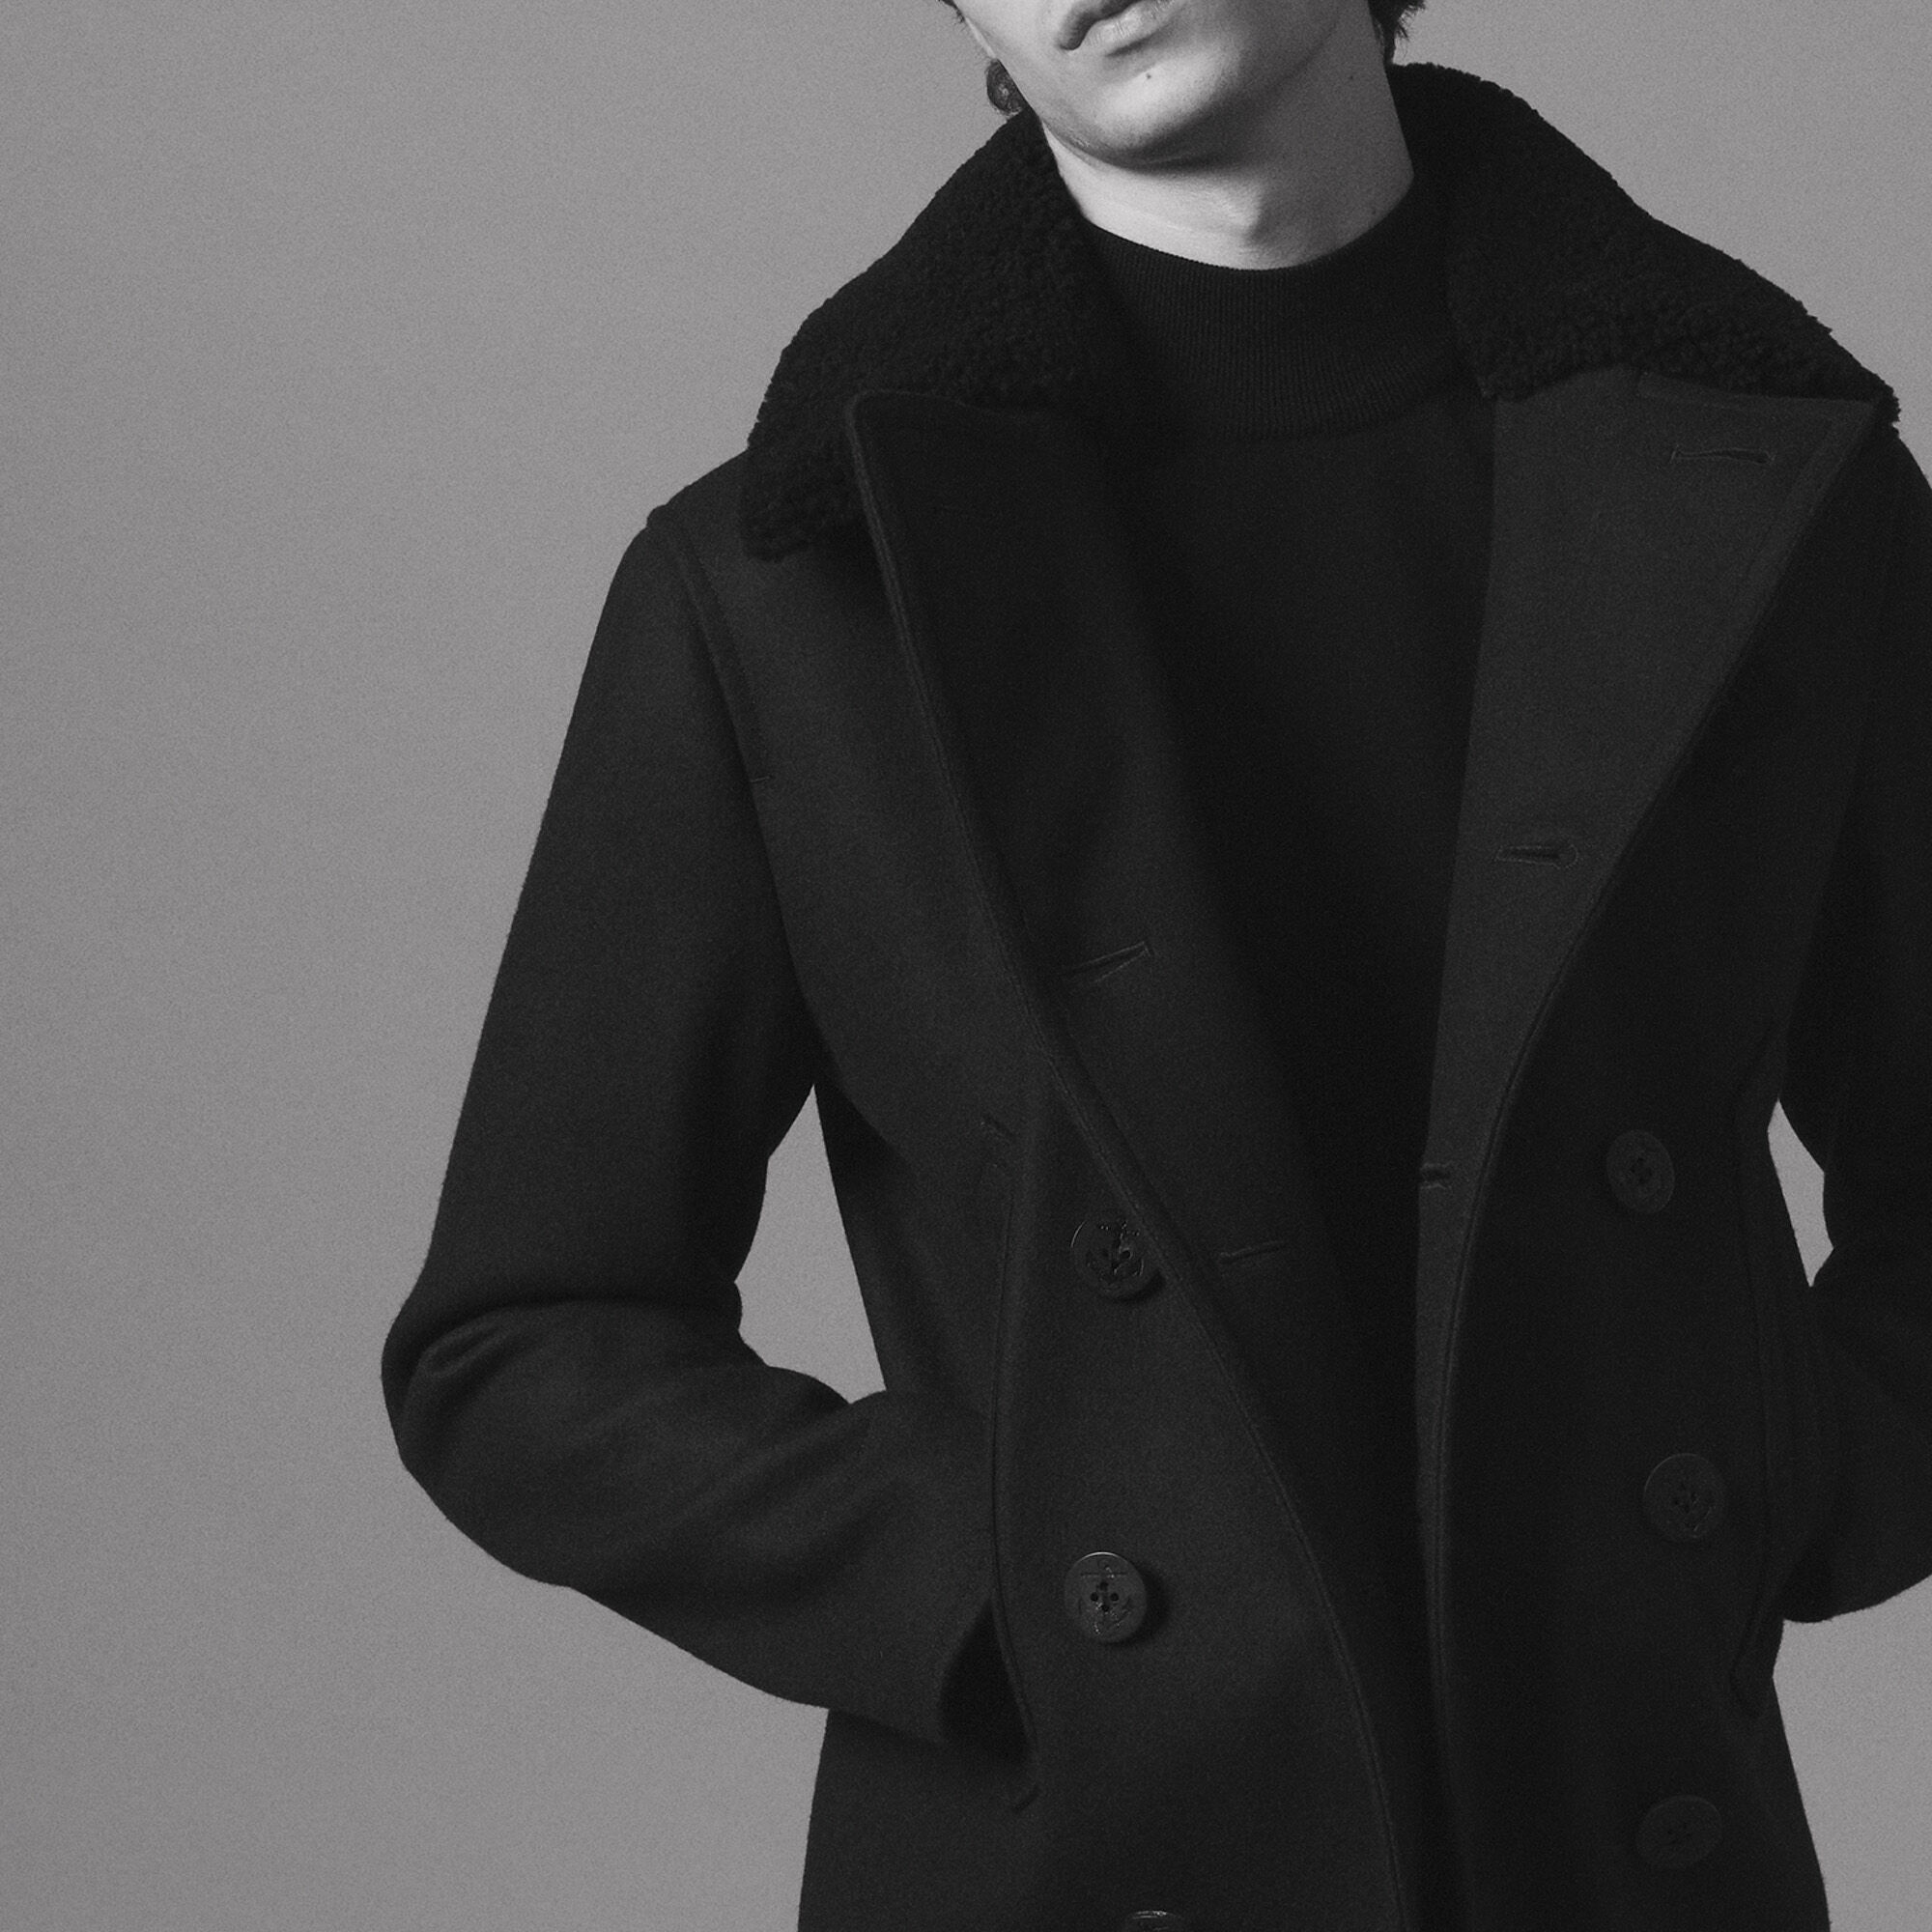 Manteau the kooples femme hiver 2018